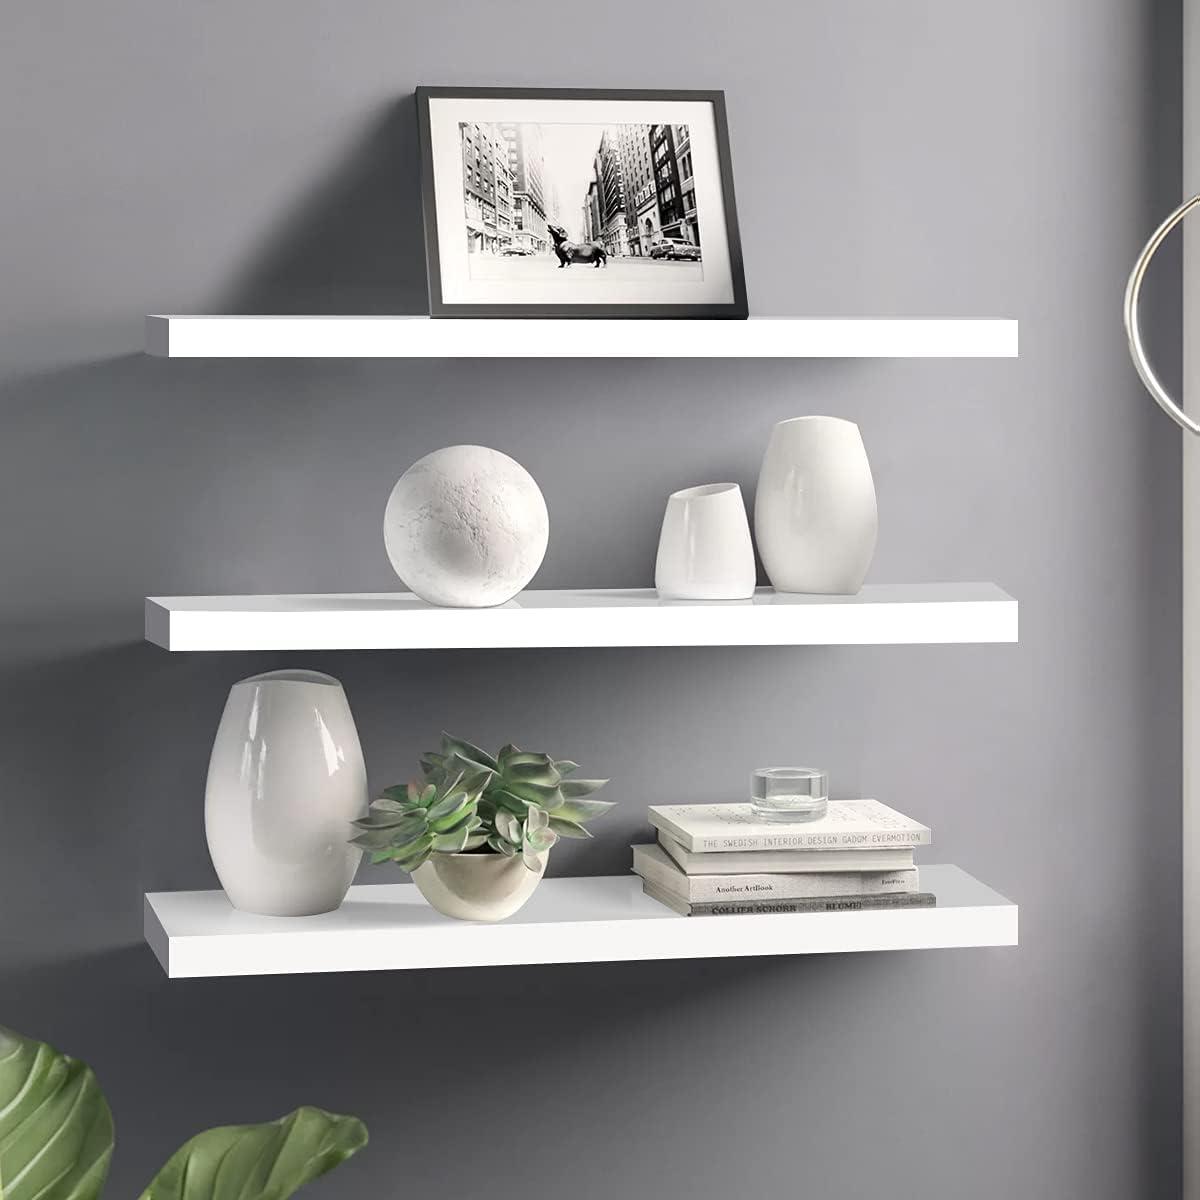 Wall Décor Floating Shelves,Book Display Shelf Wall Mounted Modern Style Home Decor Ledge Shelf,3 Pack White Wall Floating Shelves,Concealed Floating Wall Shelves